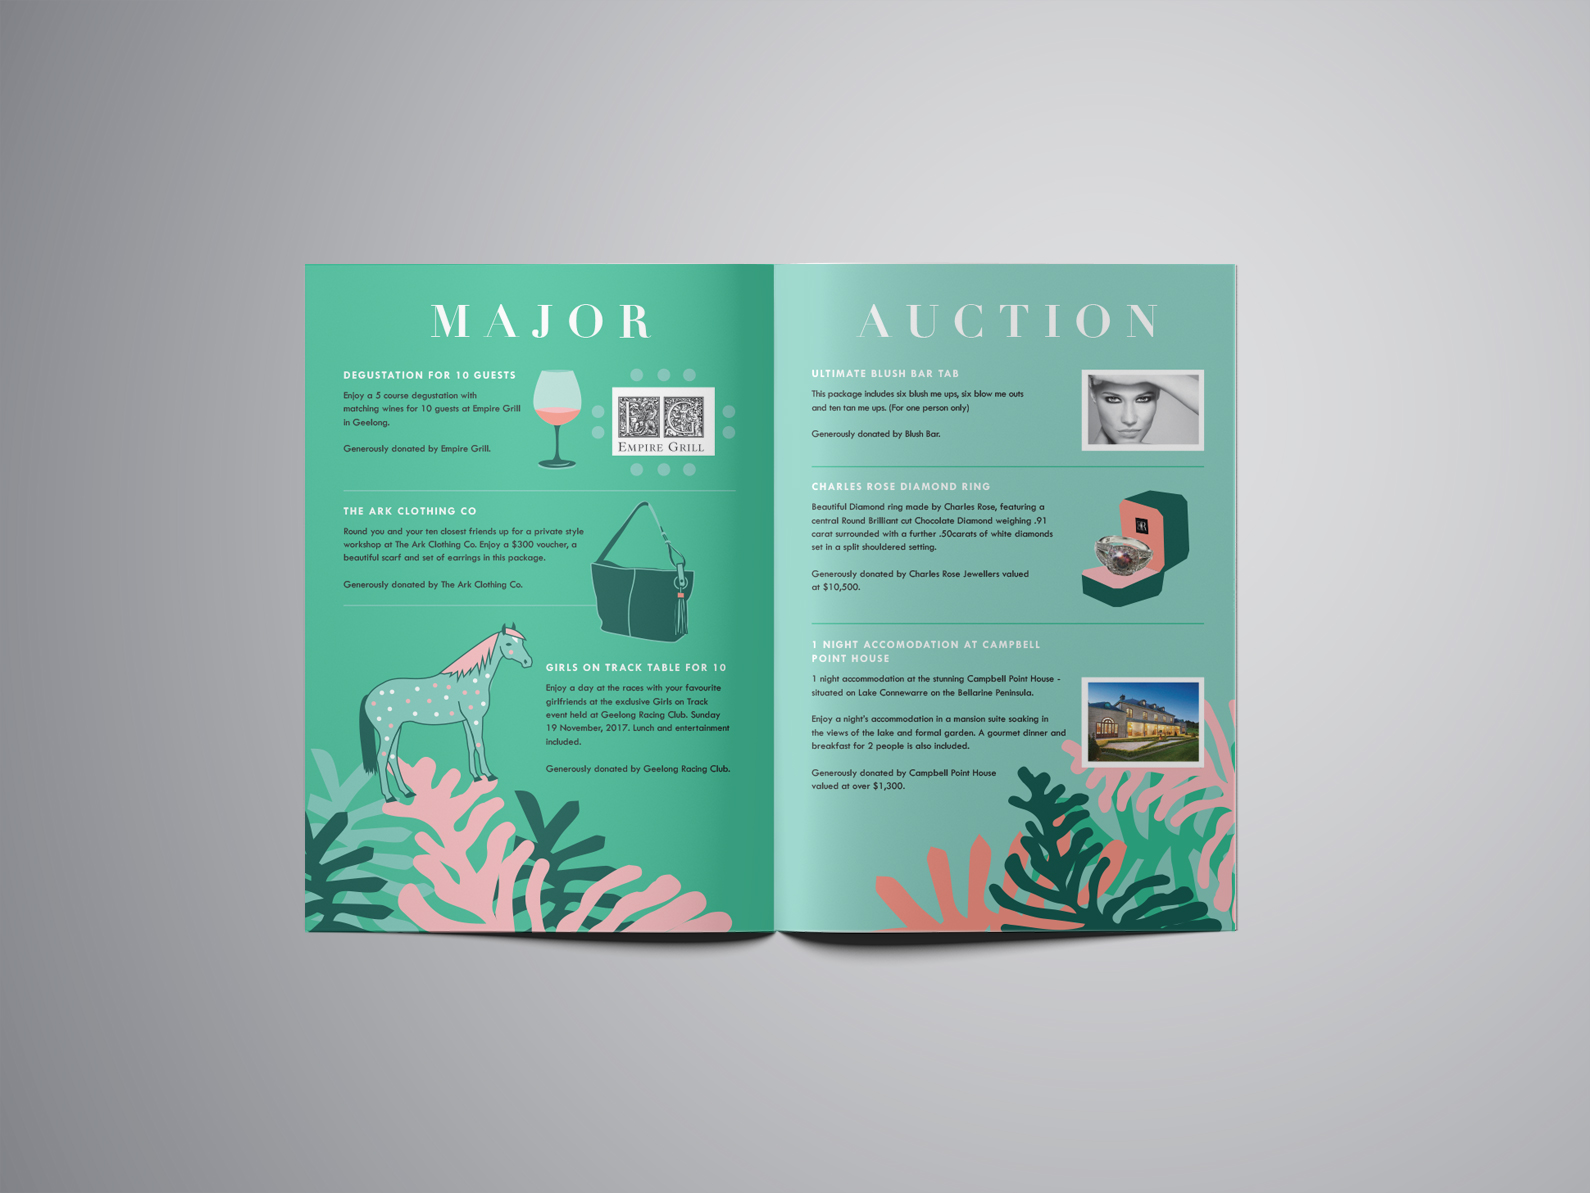 Studio-Mimi-MOon-Catwalk-for-Cancer-Event-Design-&-Identity-&-Publication-Design